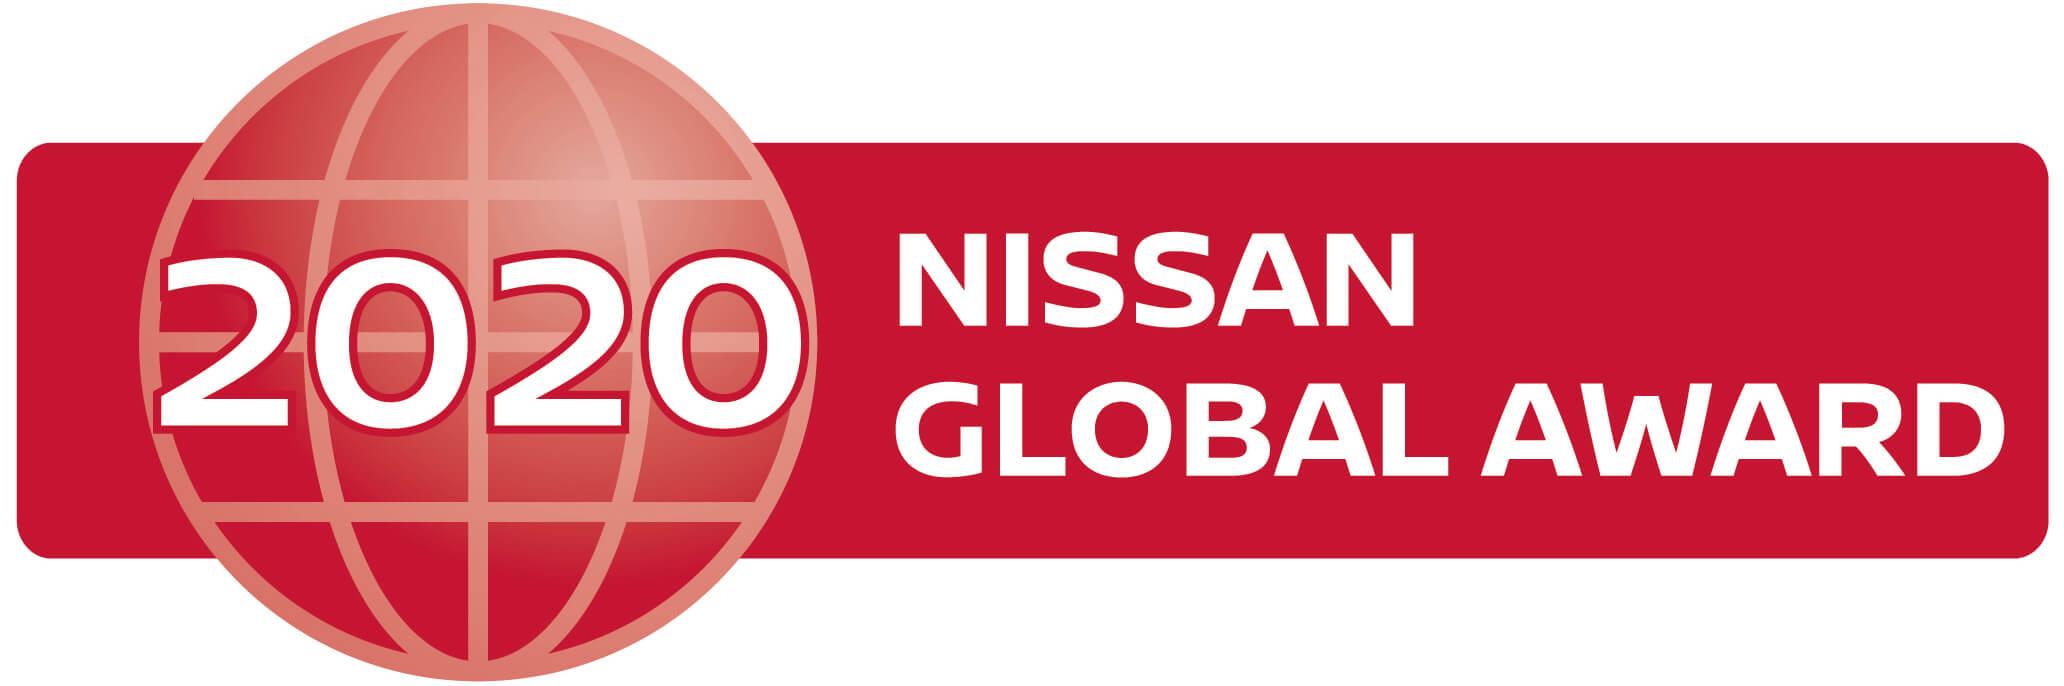 New Used Nissan Dealer Ventura Thousand Oaks Oxnard Team Nissan